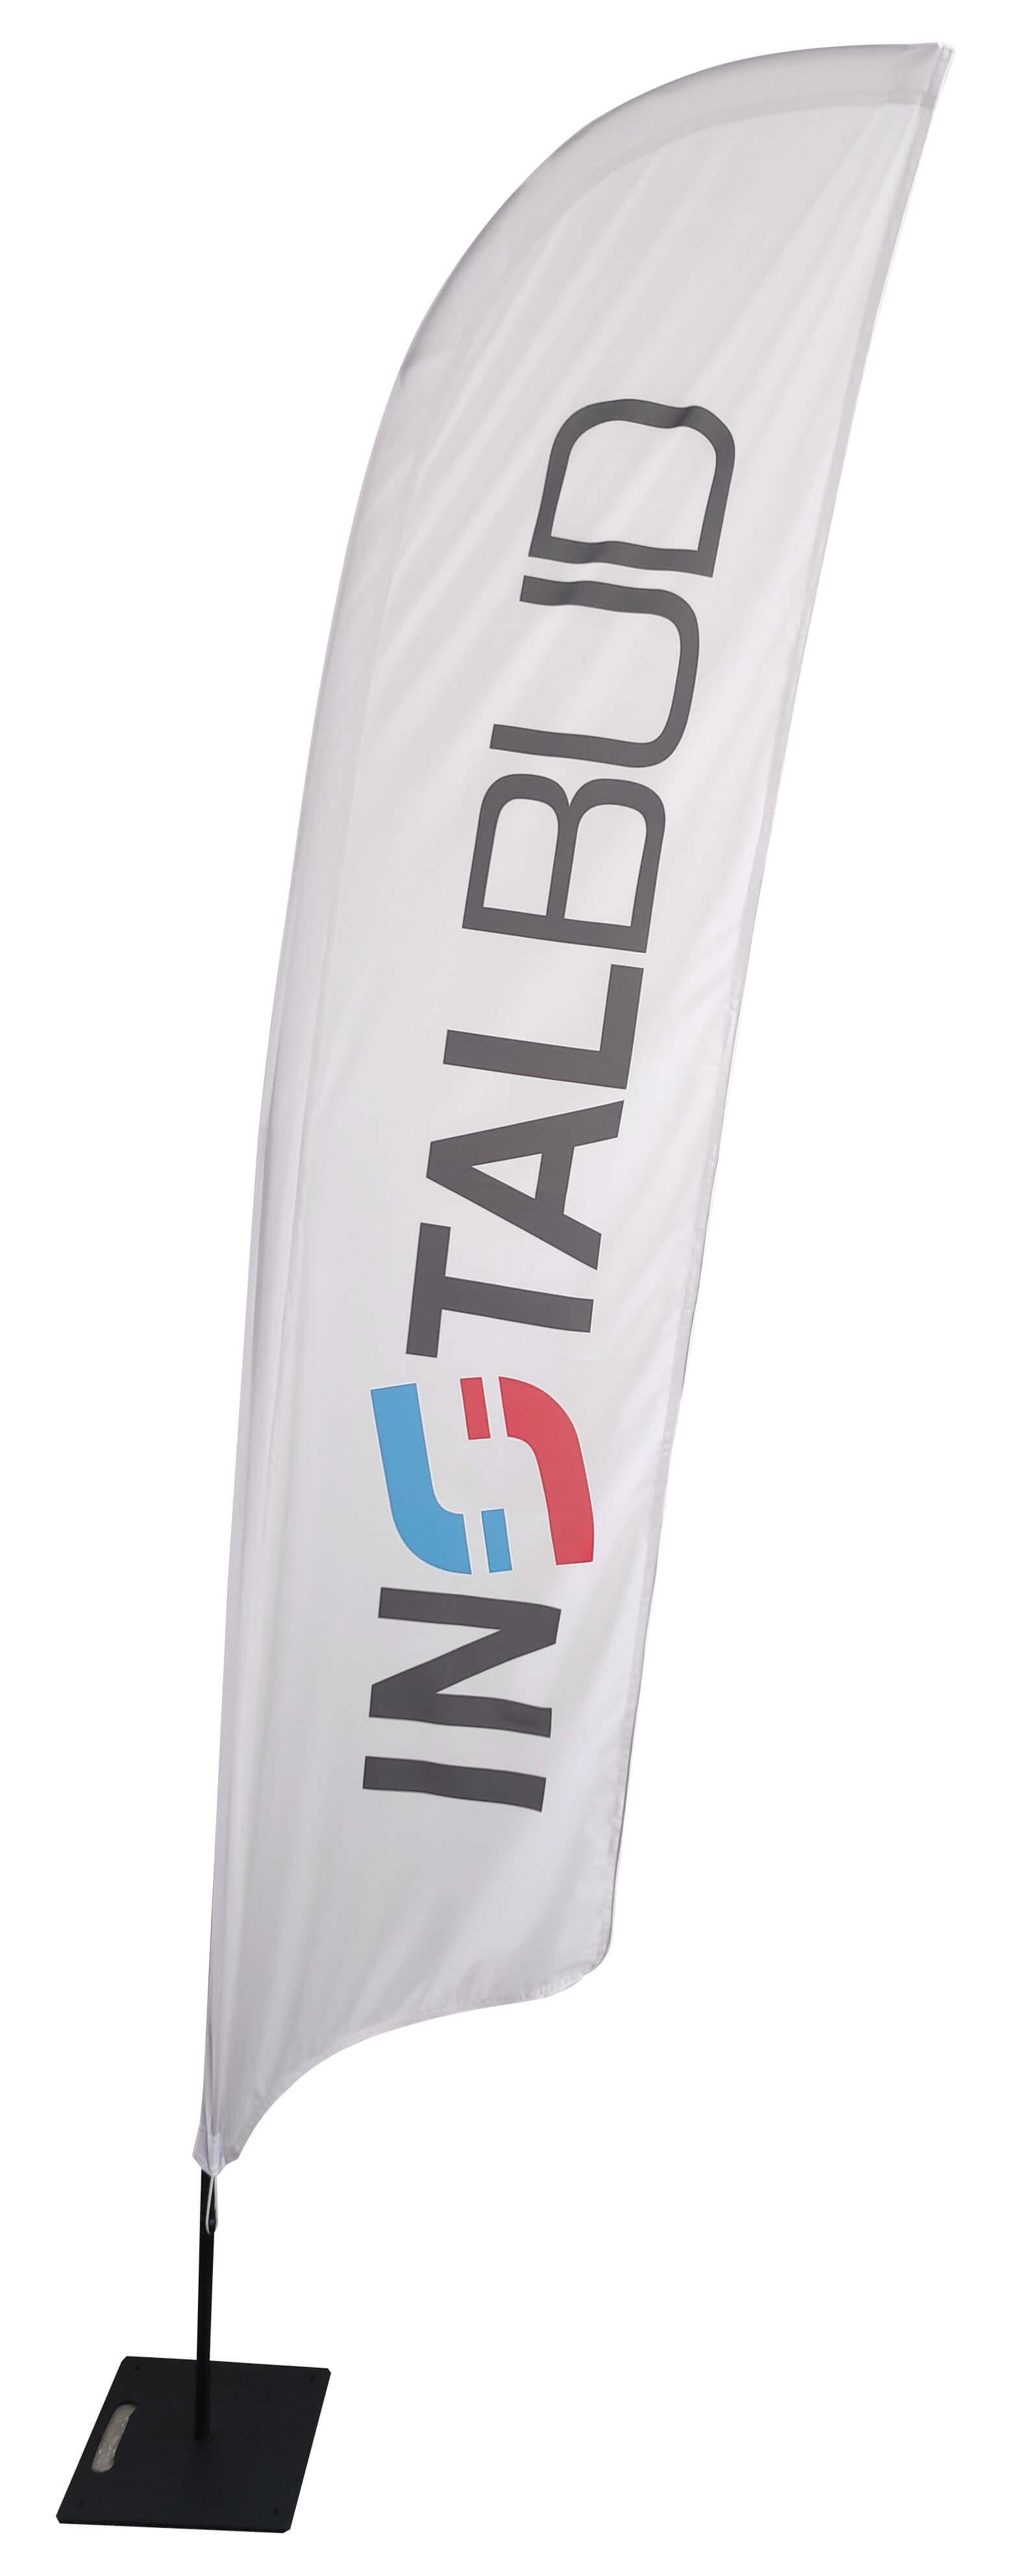 instalbud-flaga-reklamowa